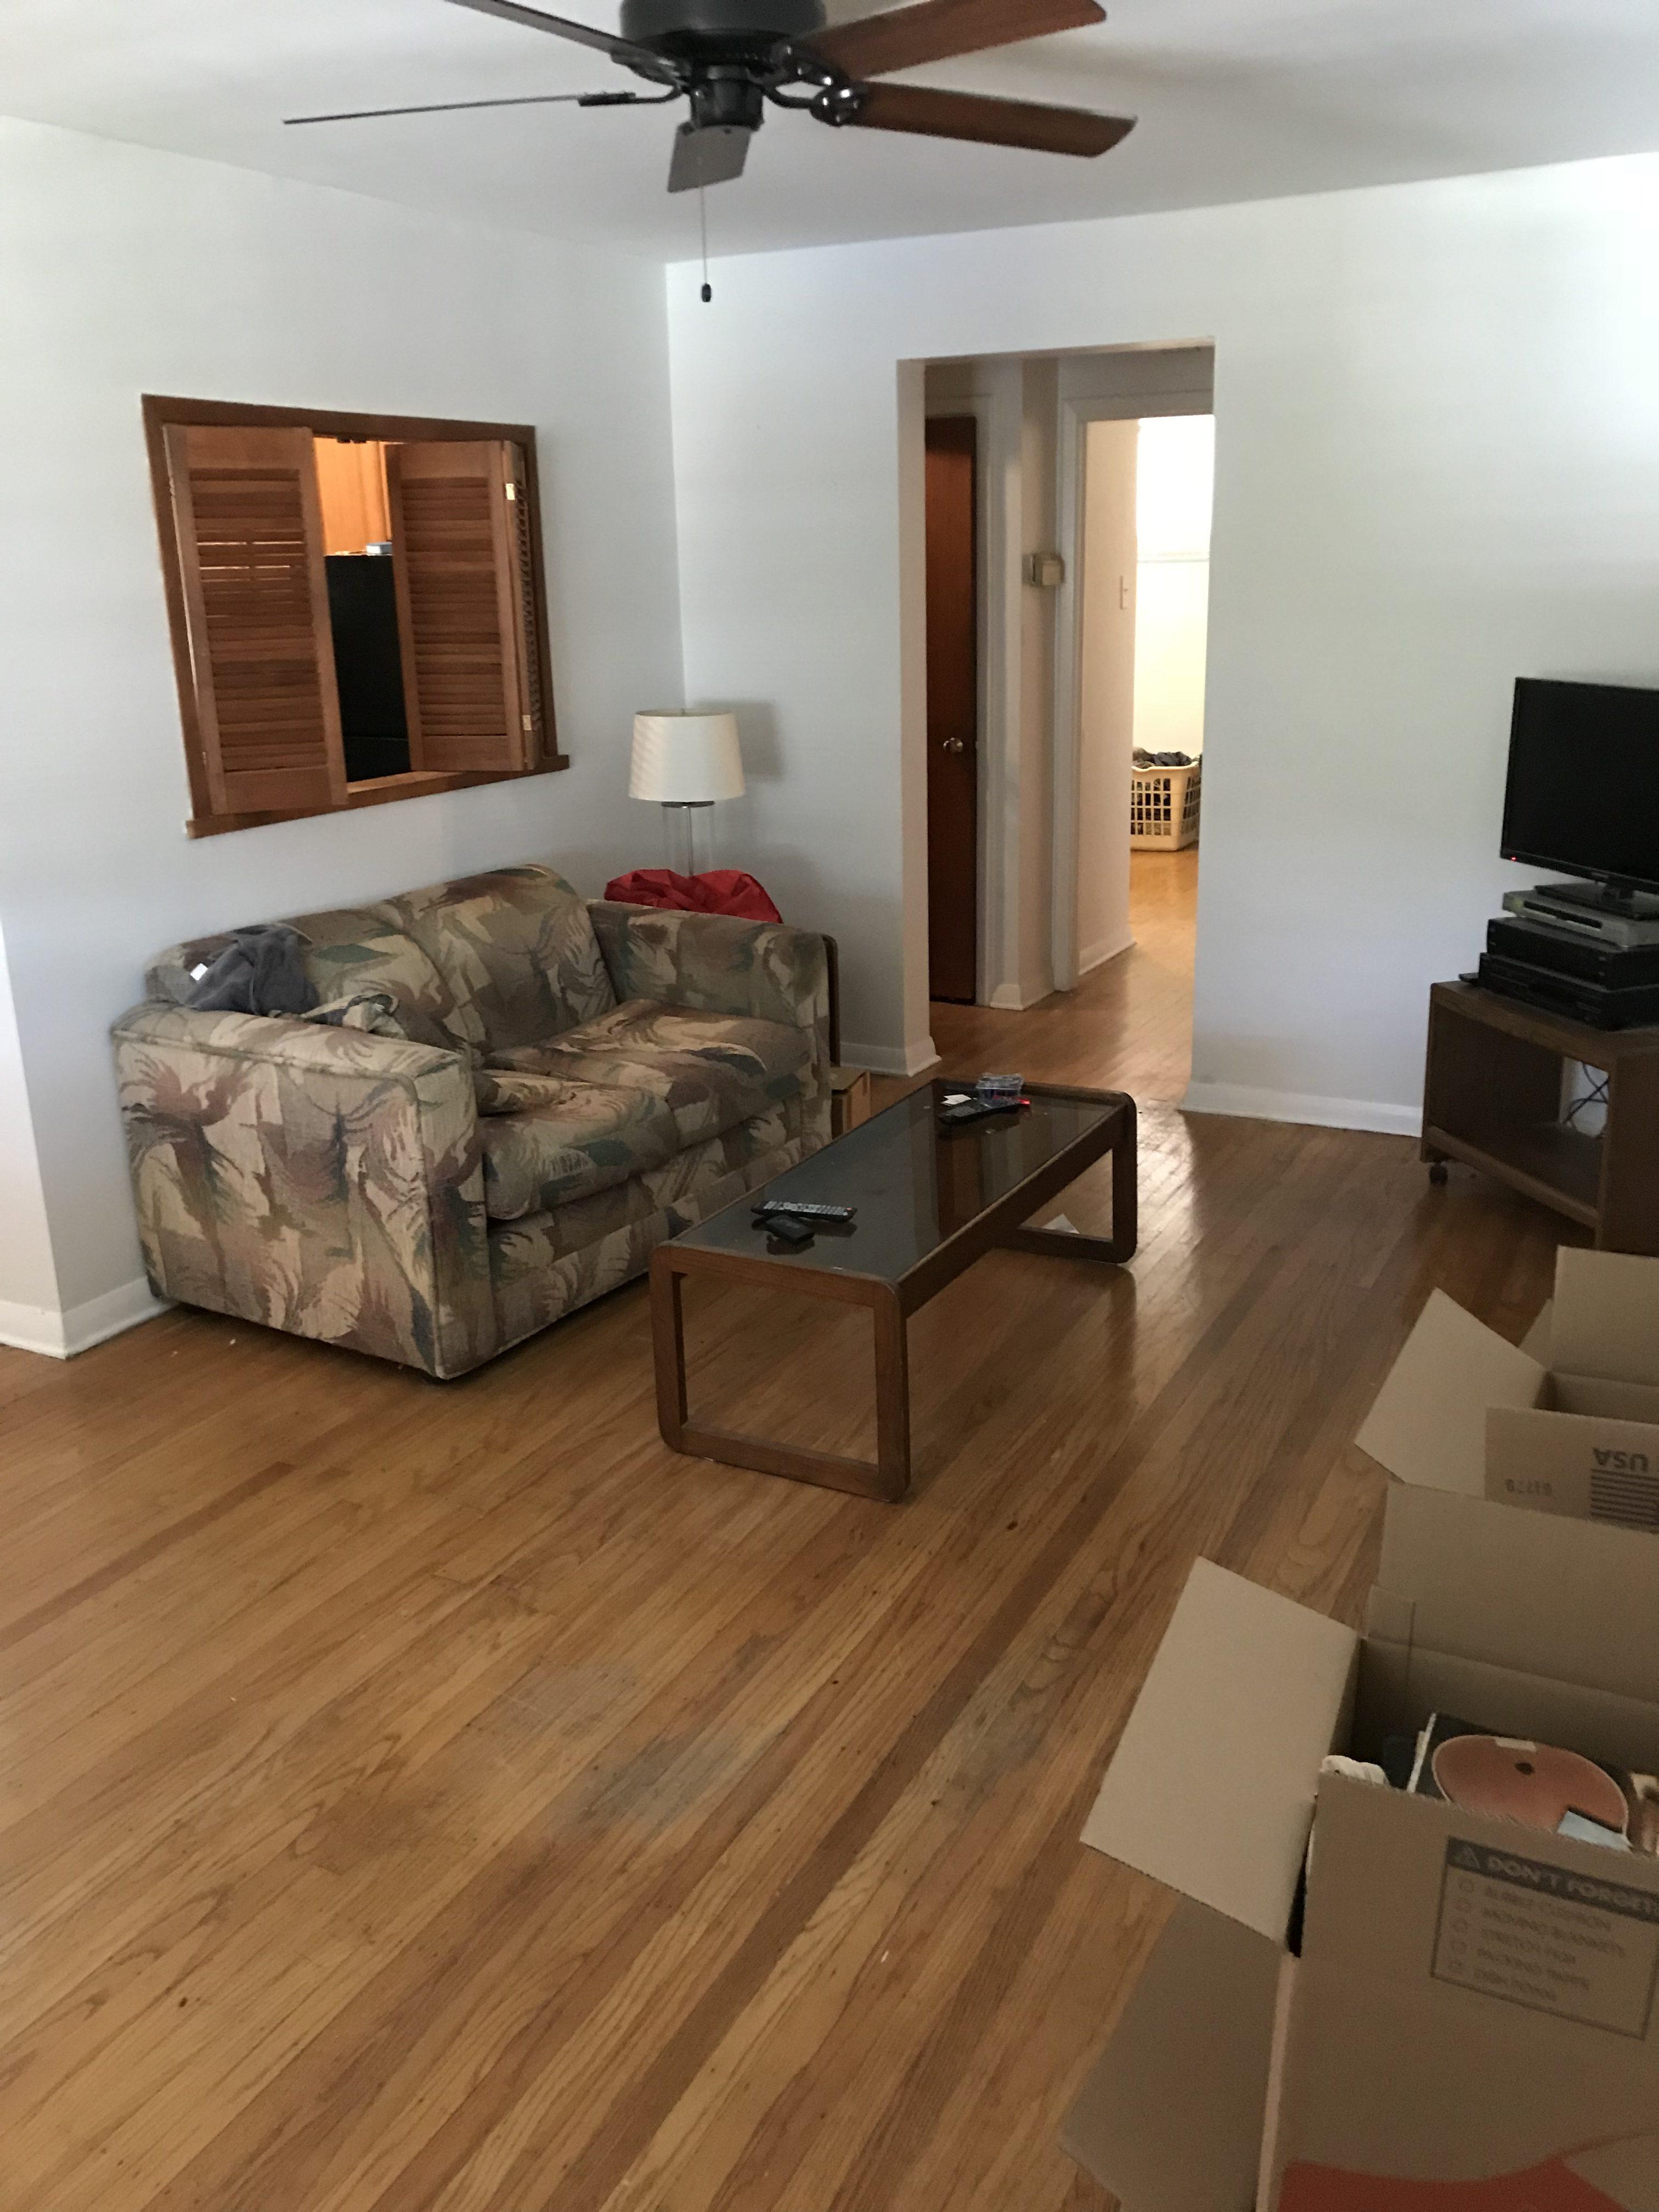 251 Blanchard living room